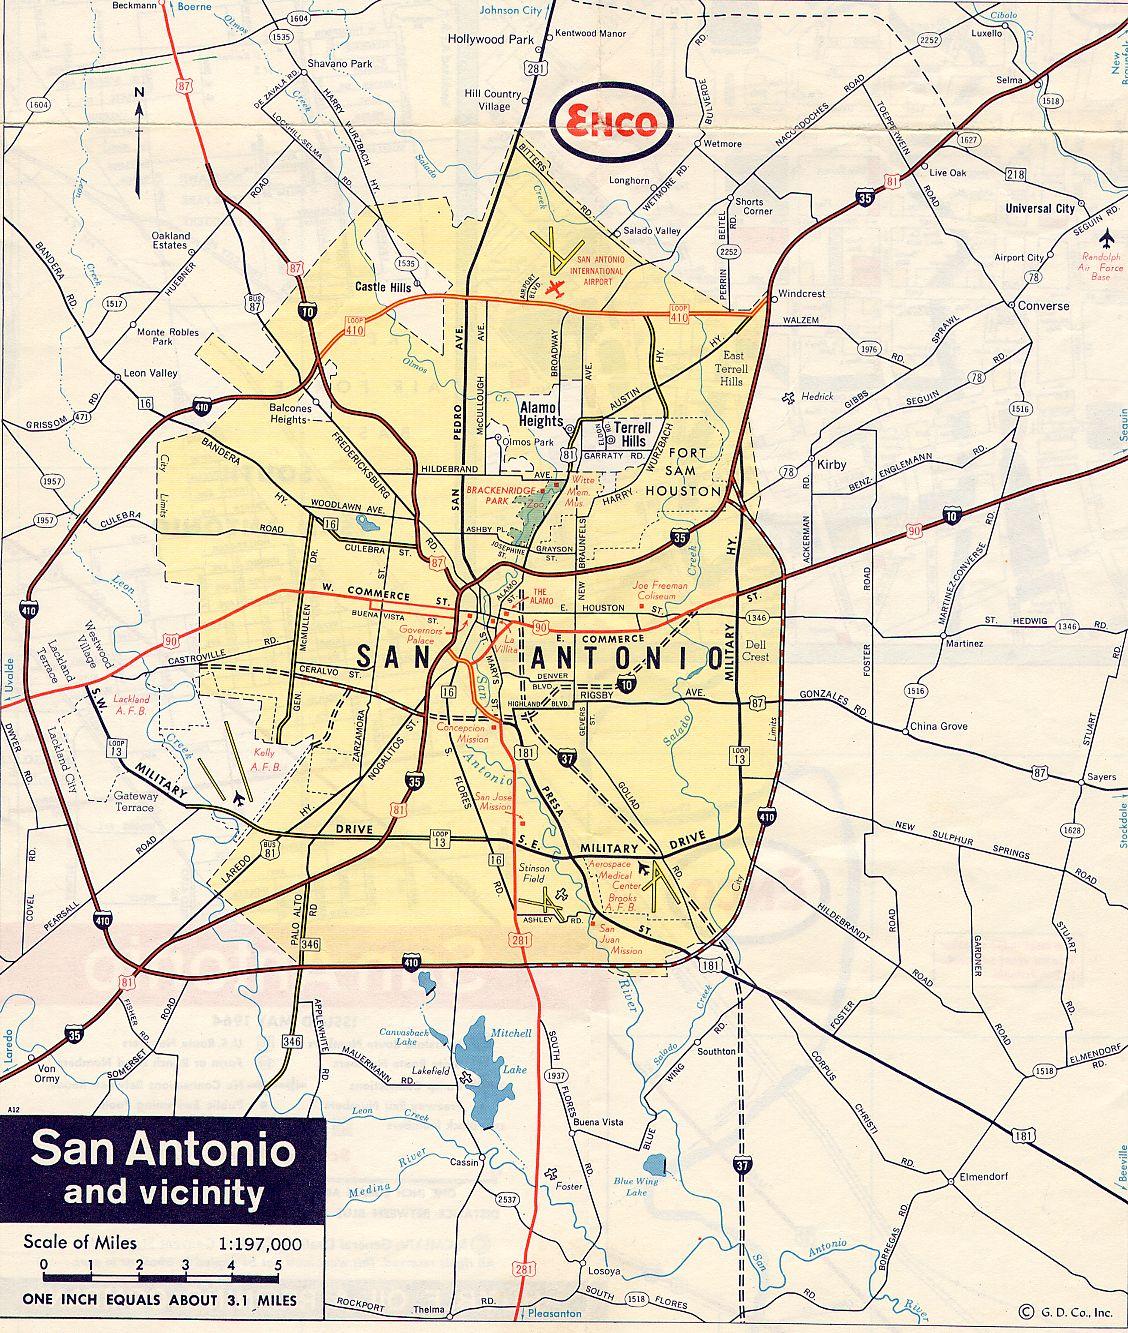 TexasFreeway > San Antonio > Historical Information > Old ...